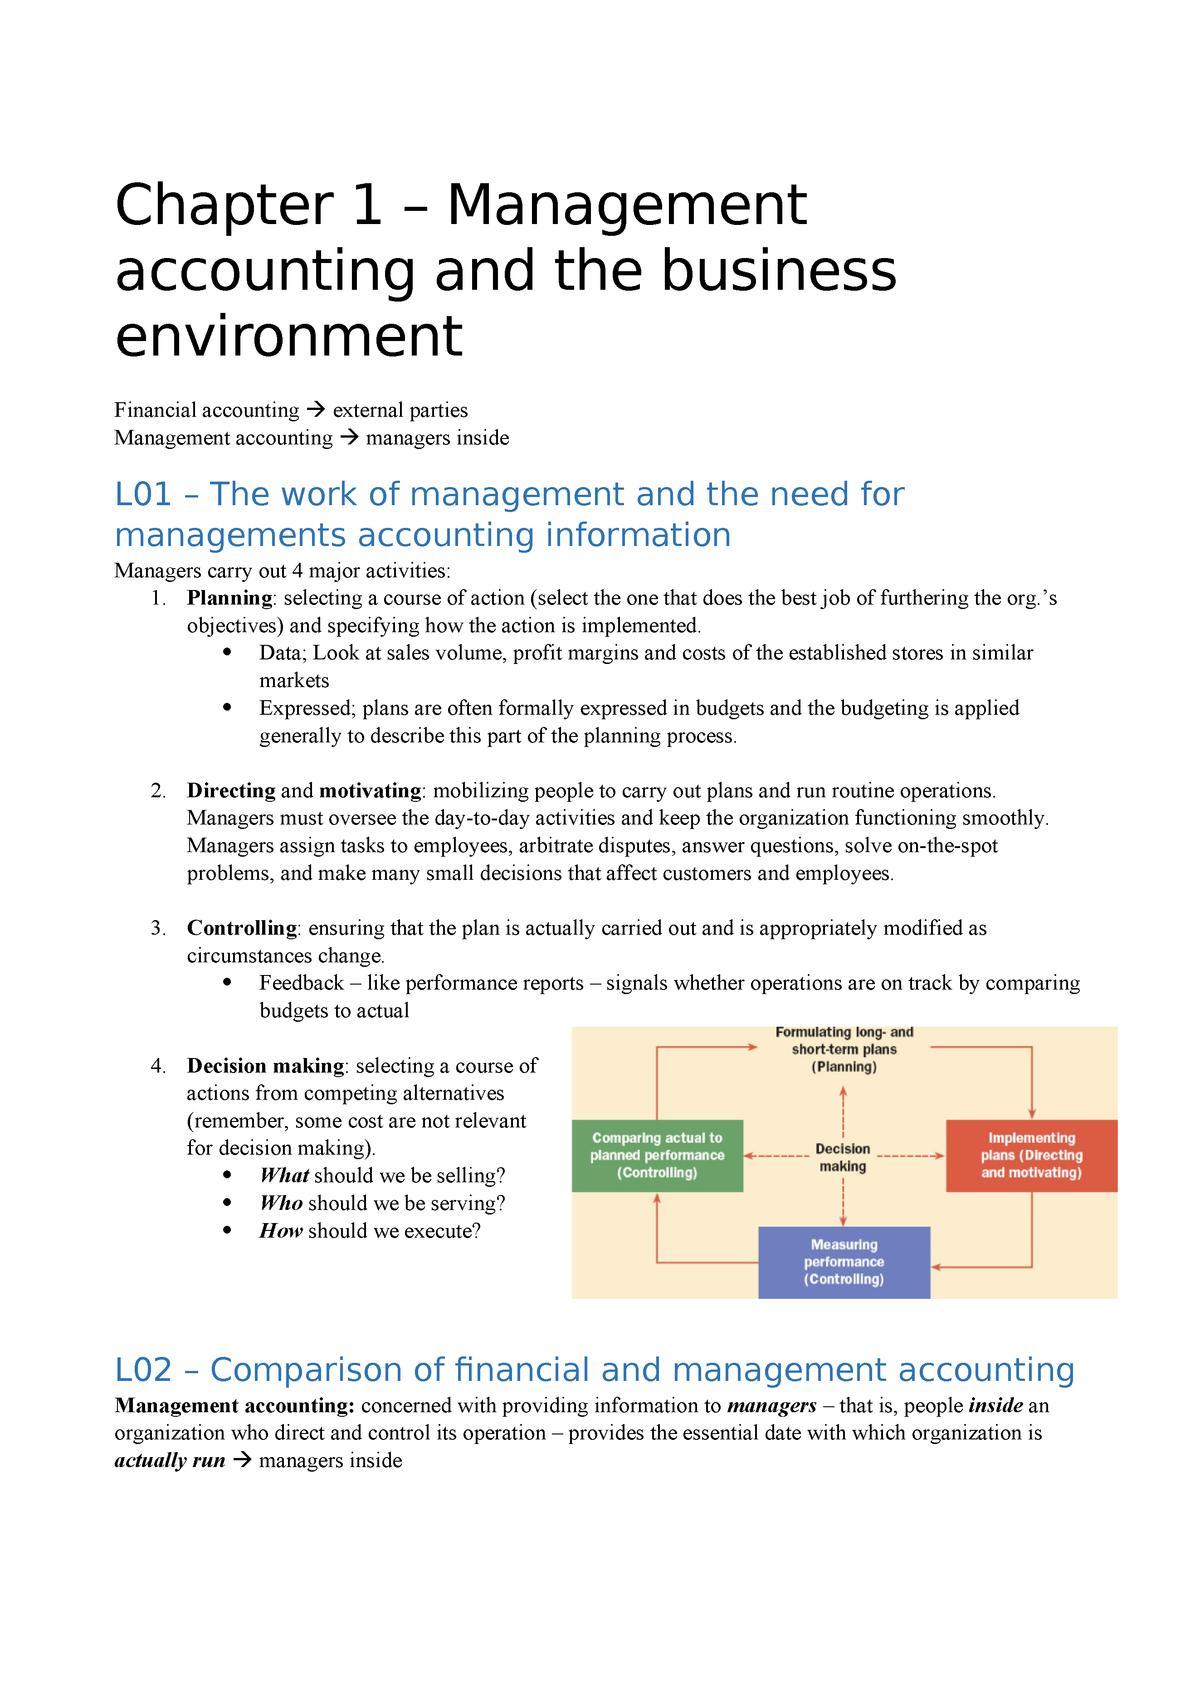 CMA Chapter notes - Resumé Management Accounting - CBS - StuDocu